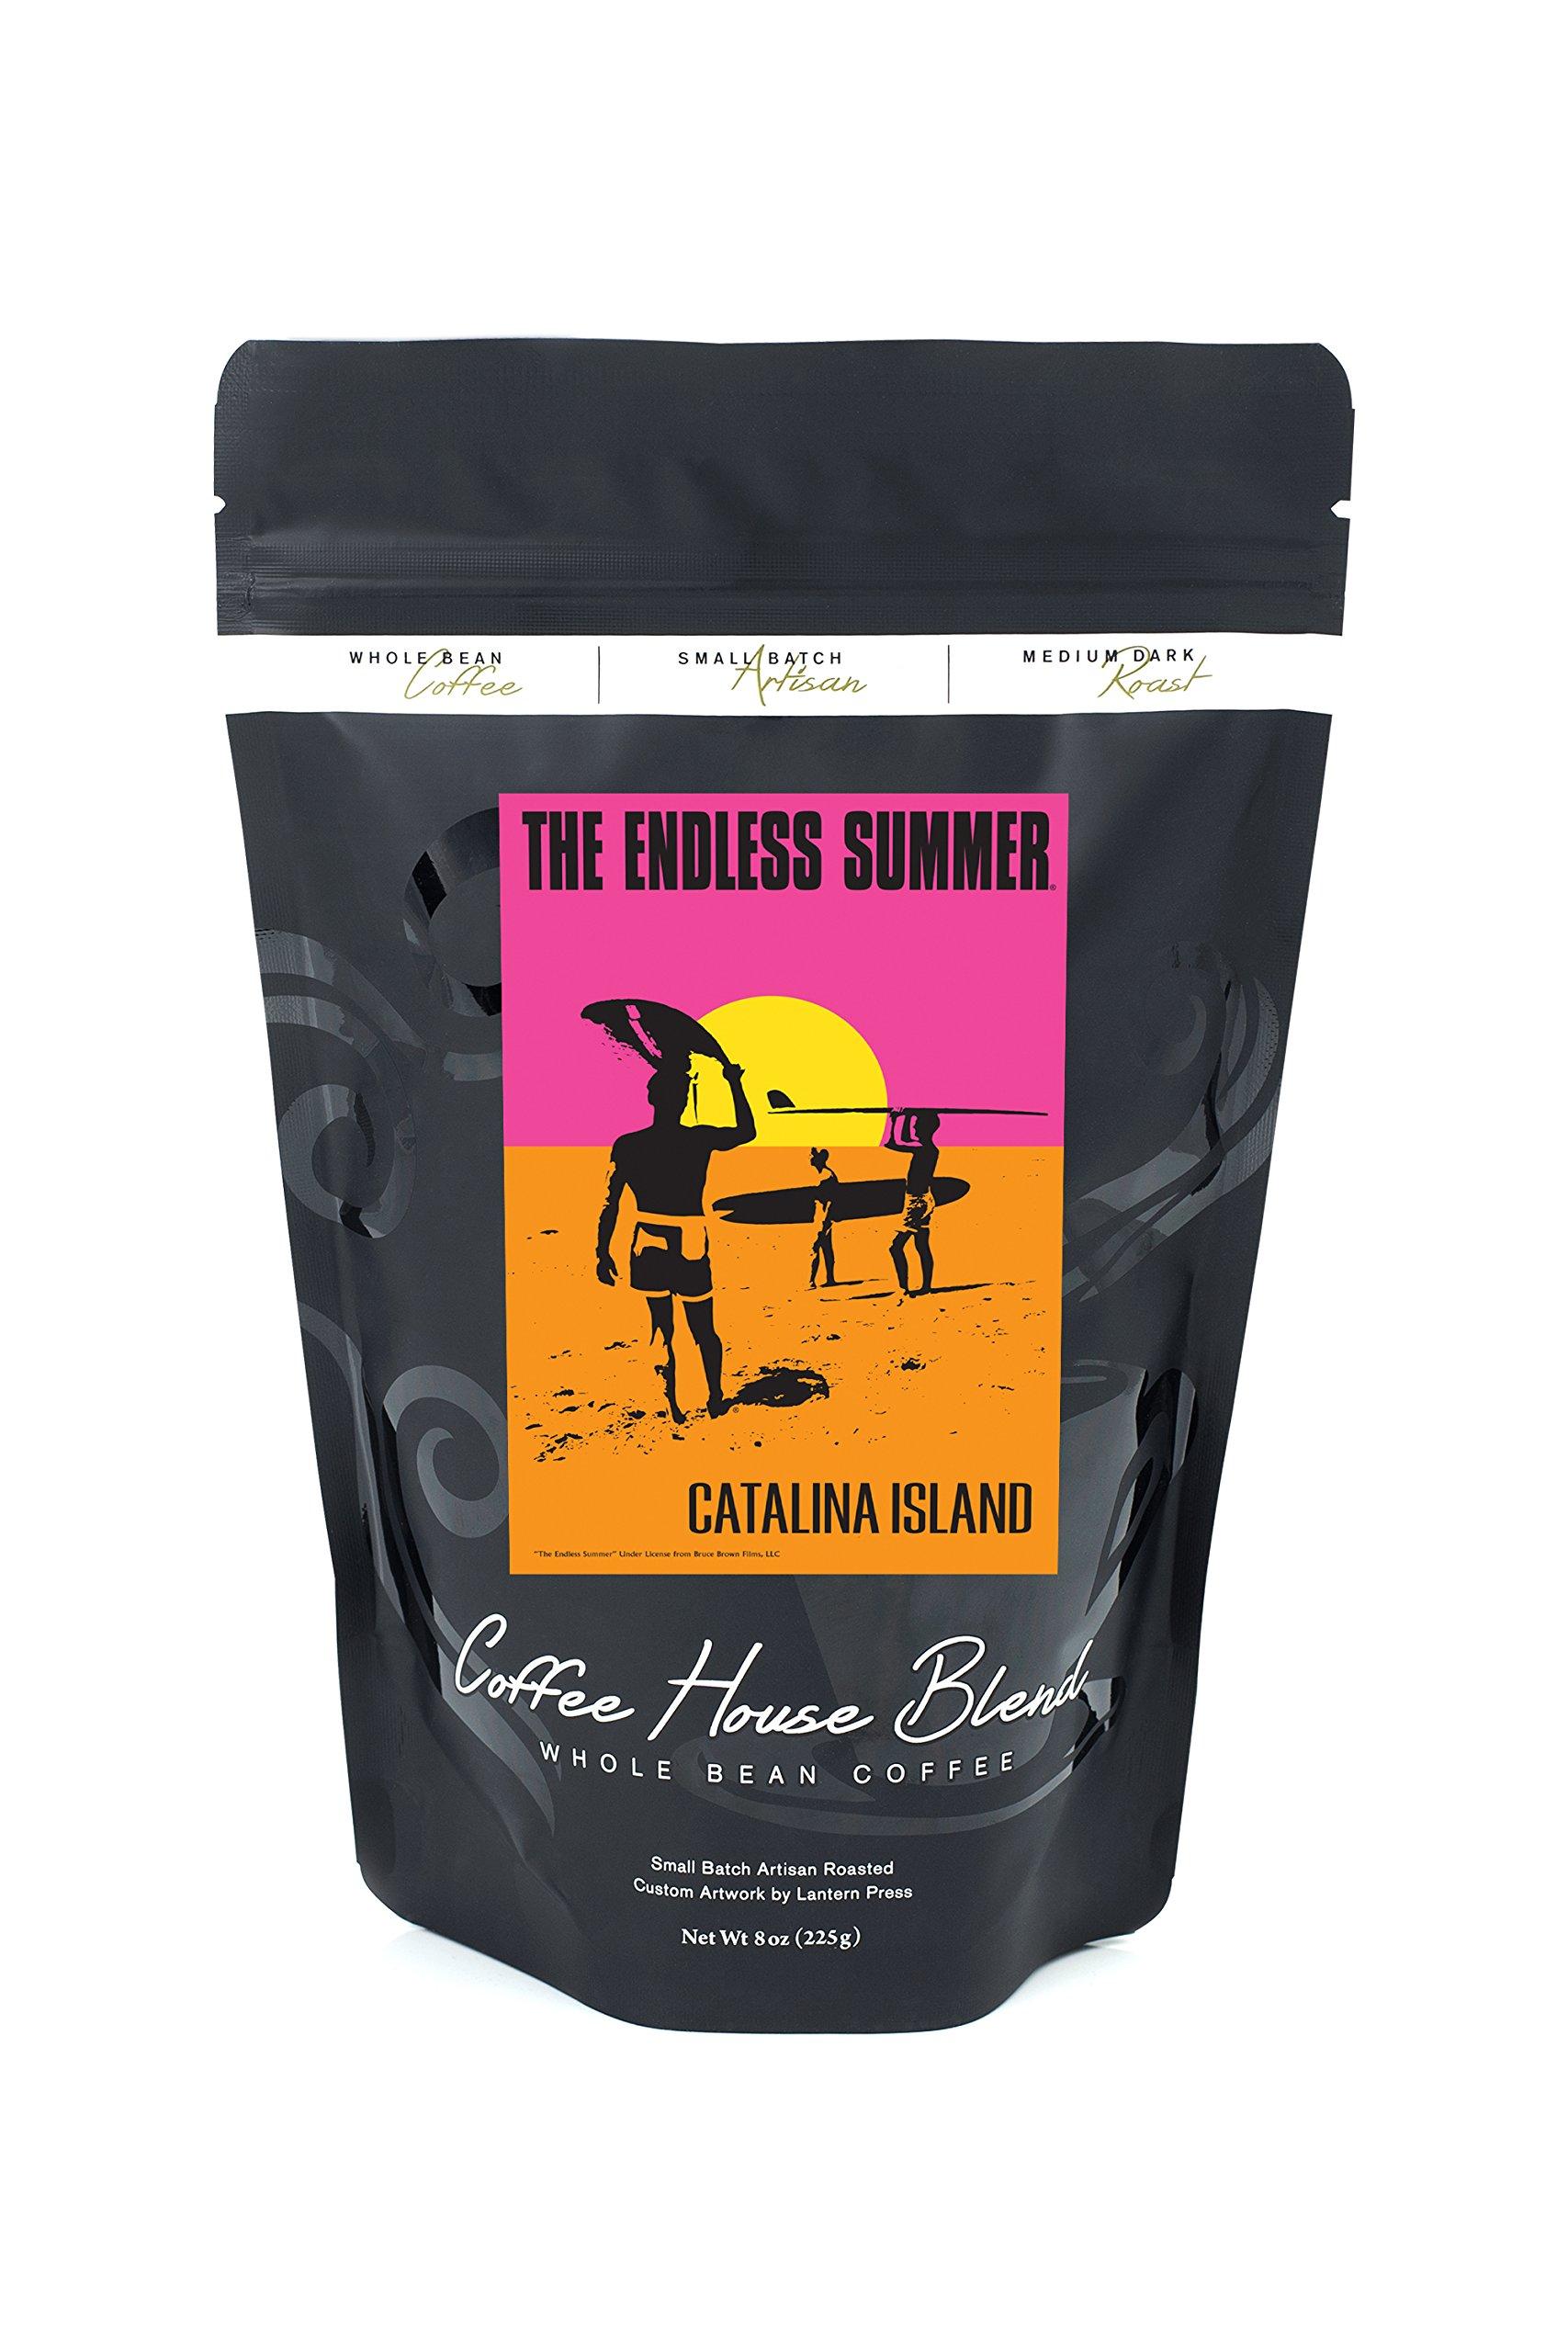 Catalina Island, California - The Endless Summer - Original Movie Poster (8oz Whole Bean Small Batch Artisan Coffee - Bold & Strong Medium Dark Roast w/ Artwork) by Lantern Press